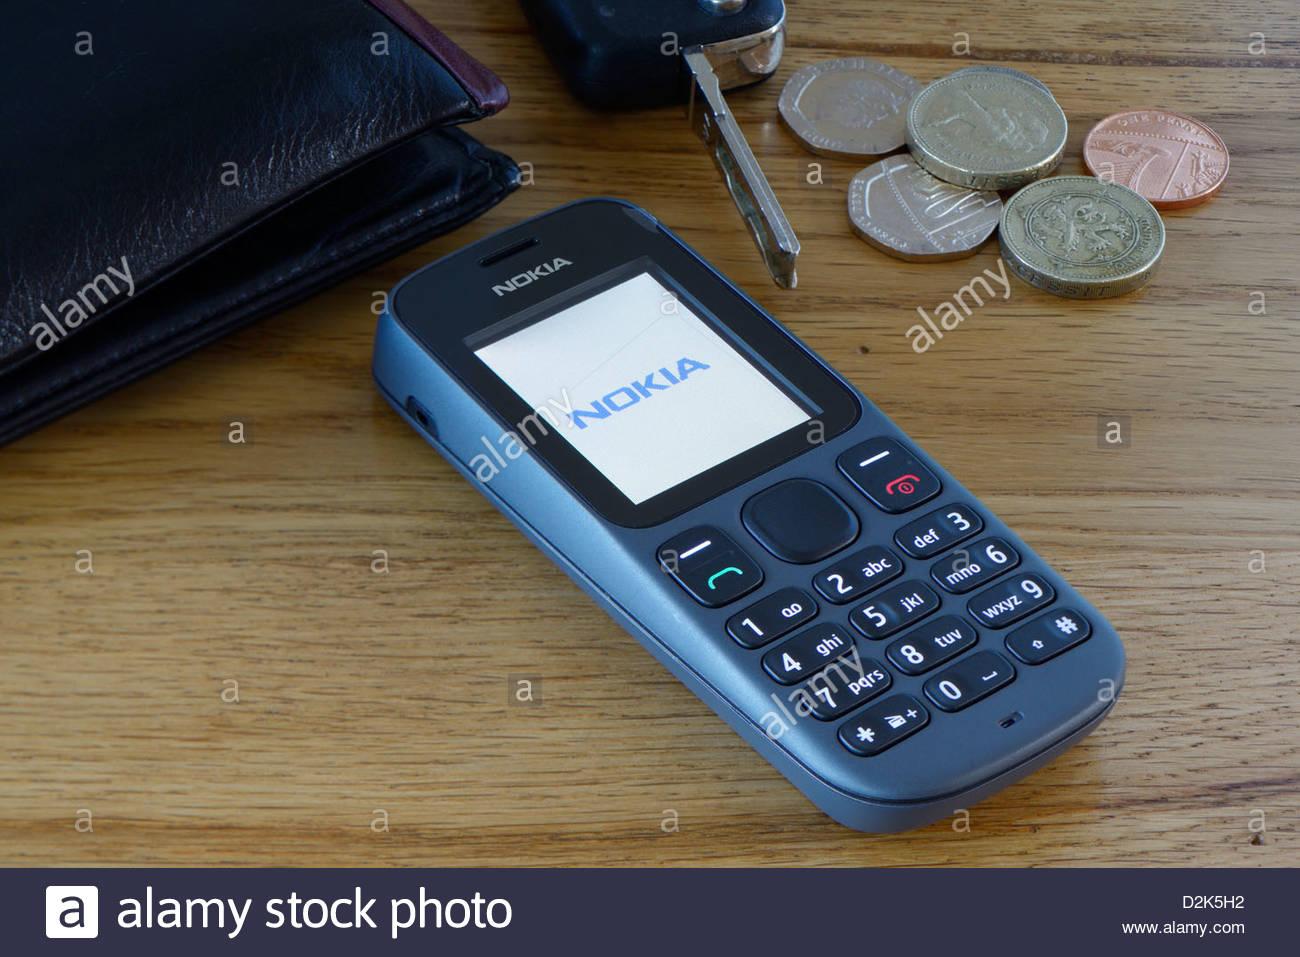 Nokia 100 mobile phone, Dorset, England - Stock Image